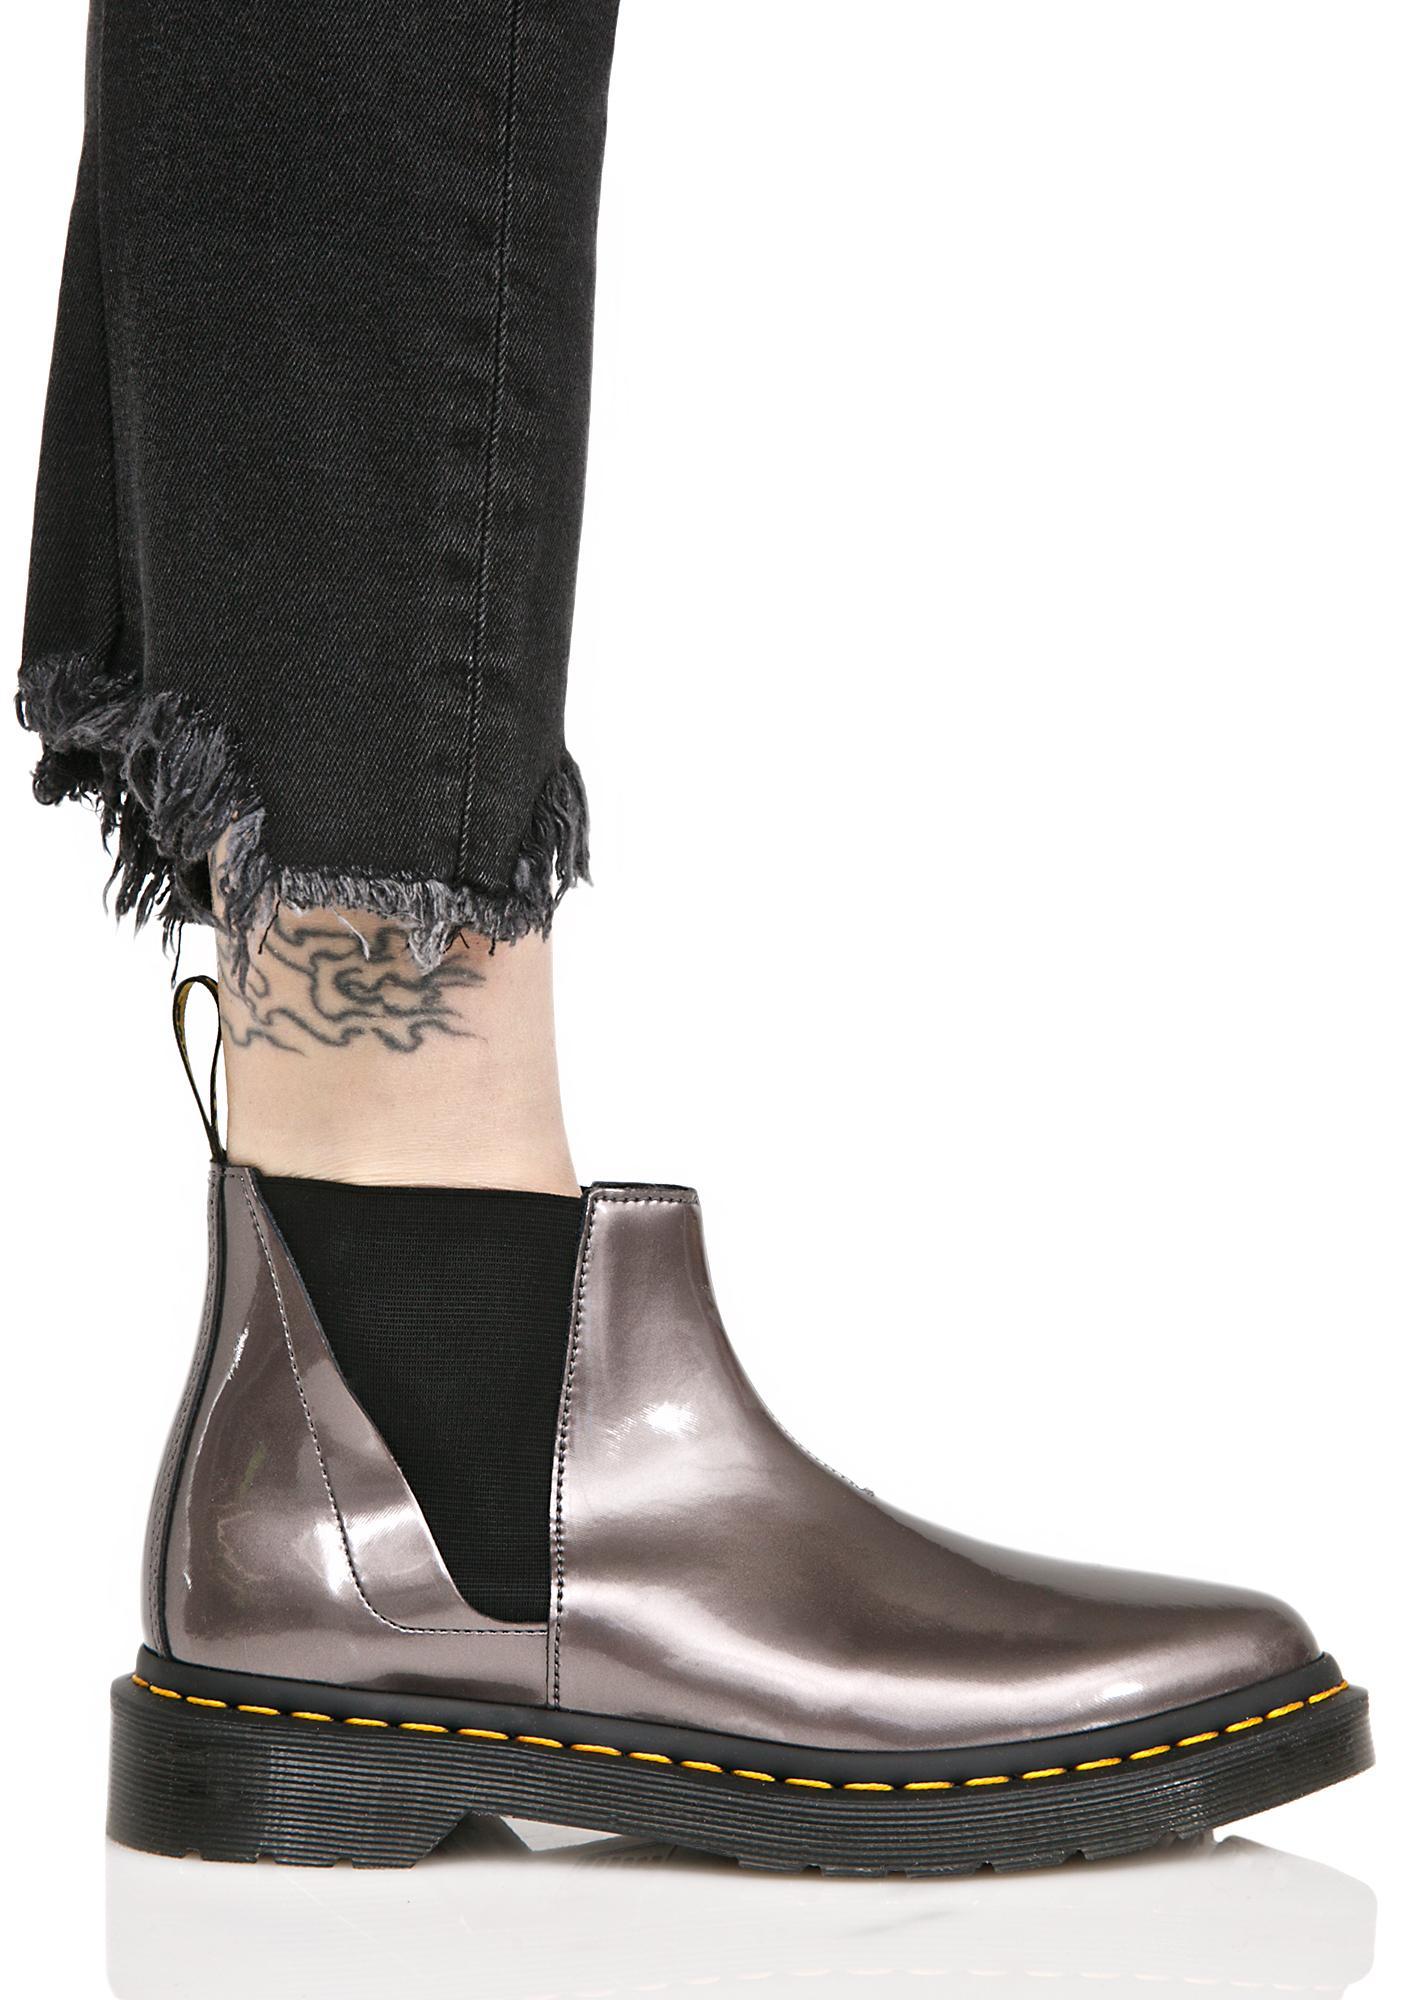 Dr. Martens Bianca Chelsea Boots